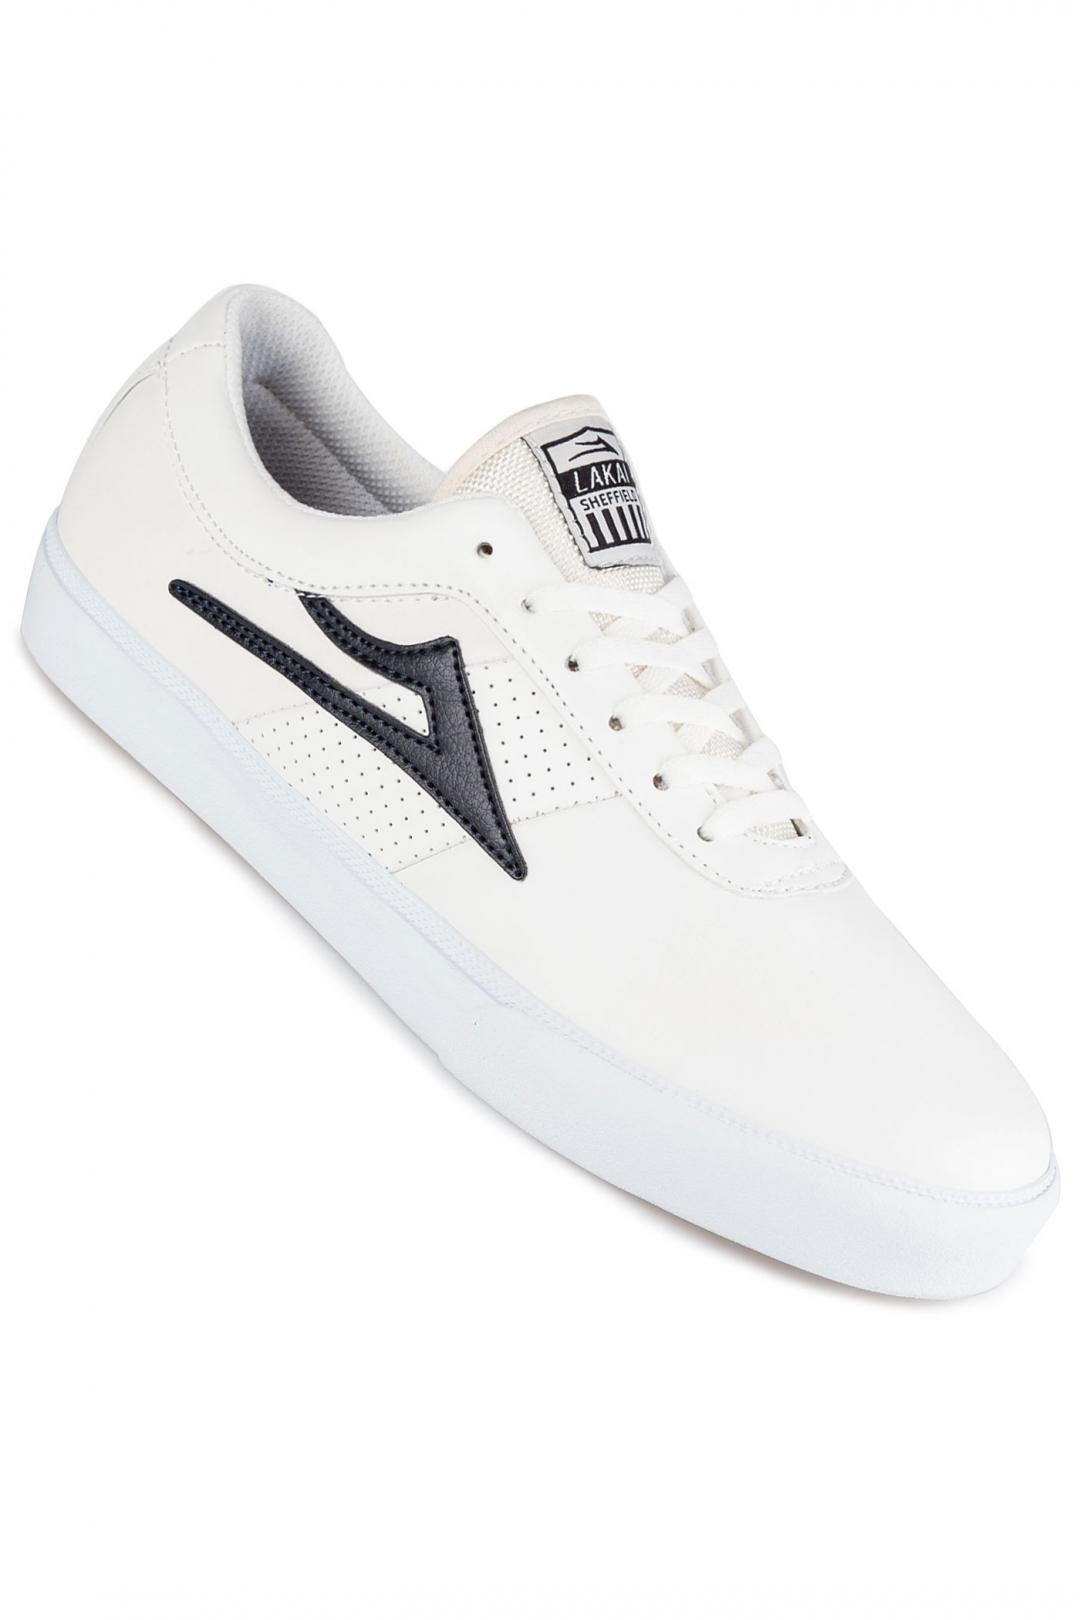 Uomo Lakai Sheffield Leather white navy | Scarpe da skate